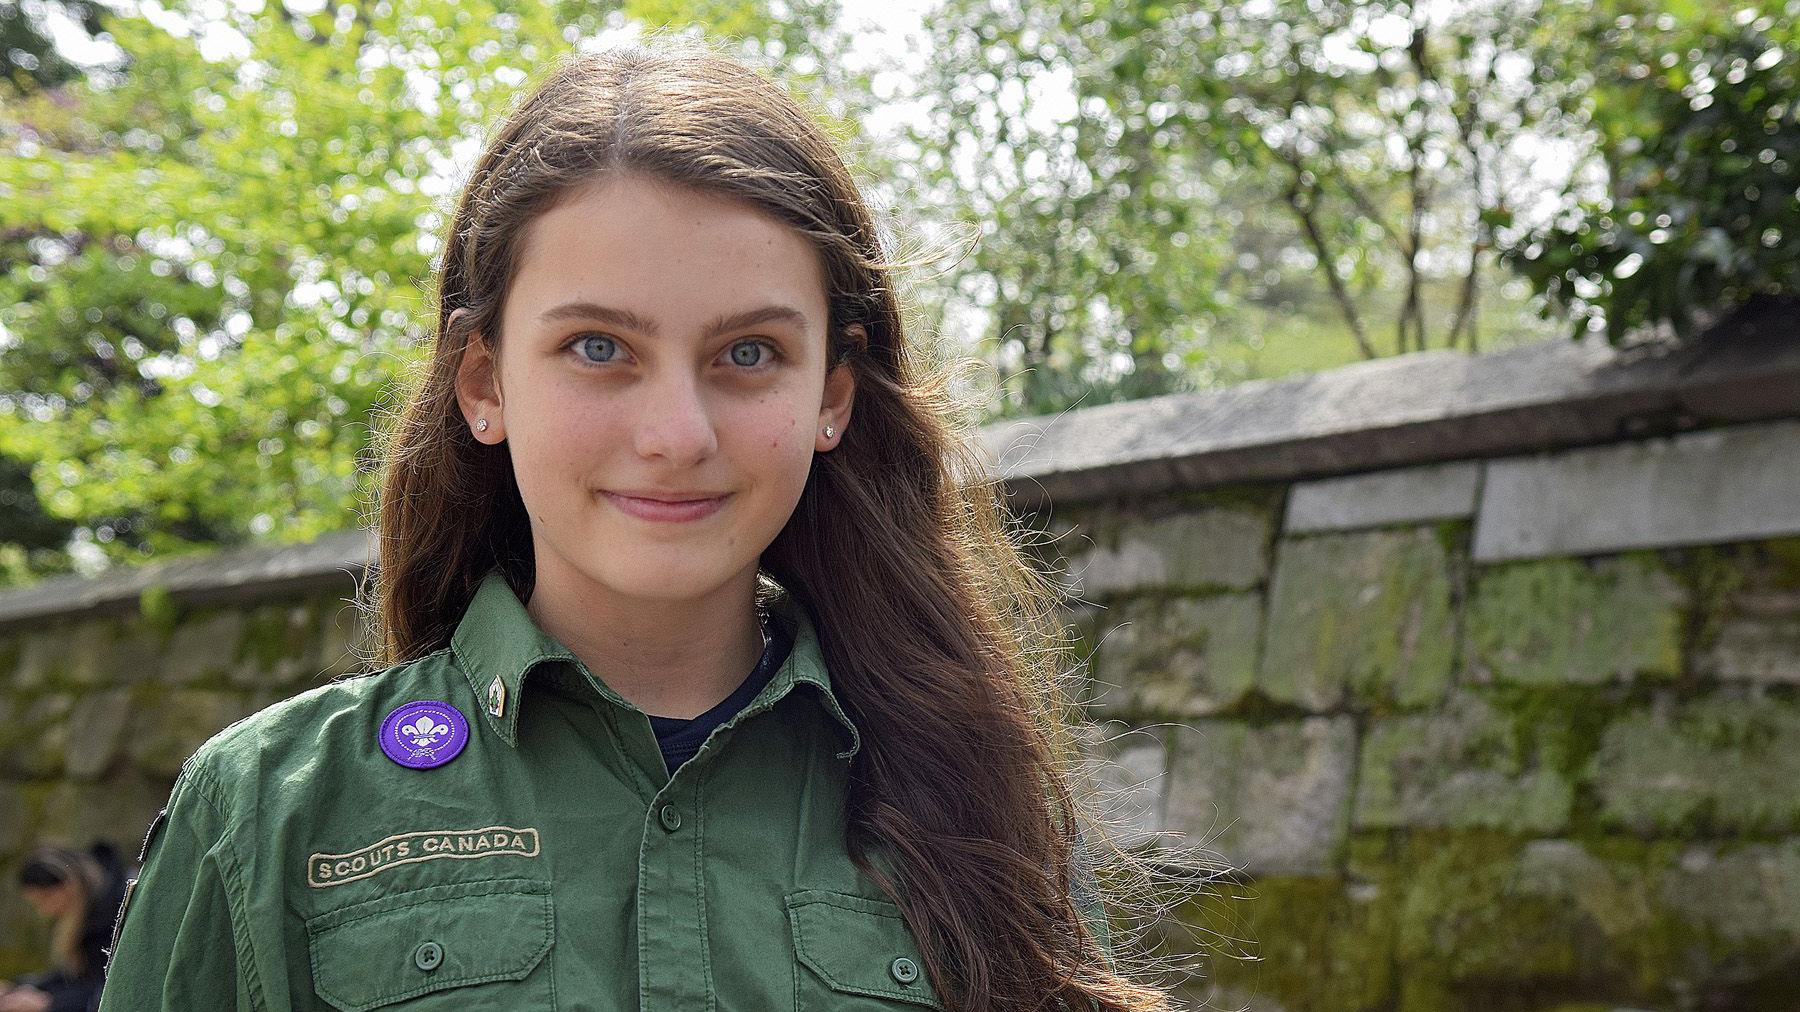 Teen girl scout